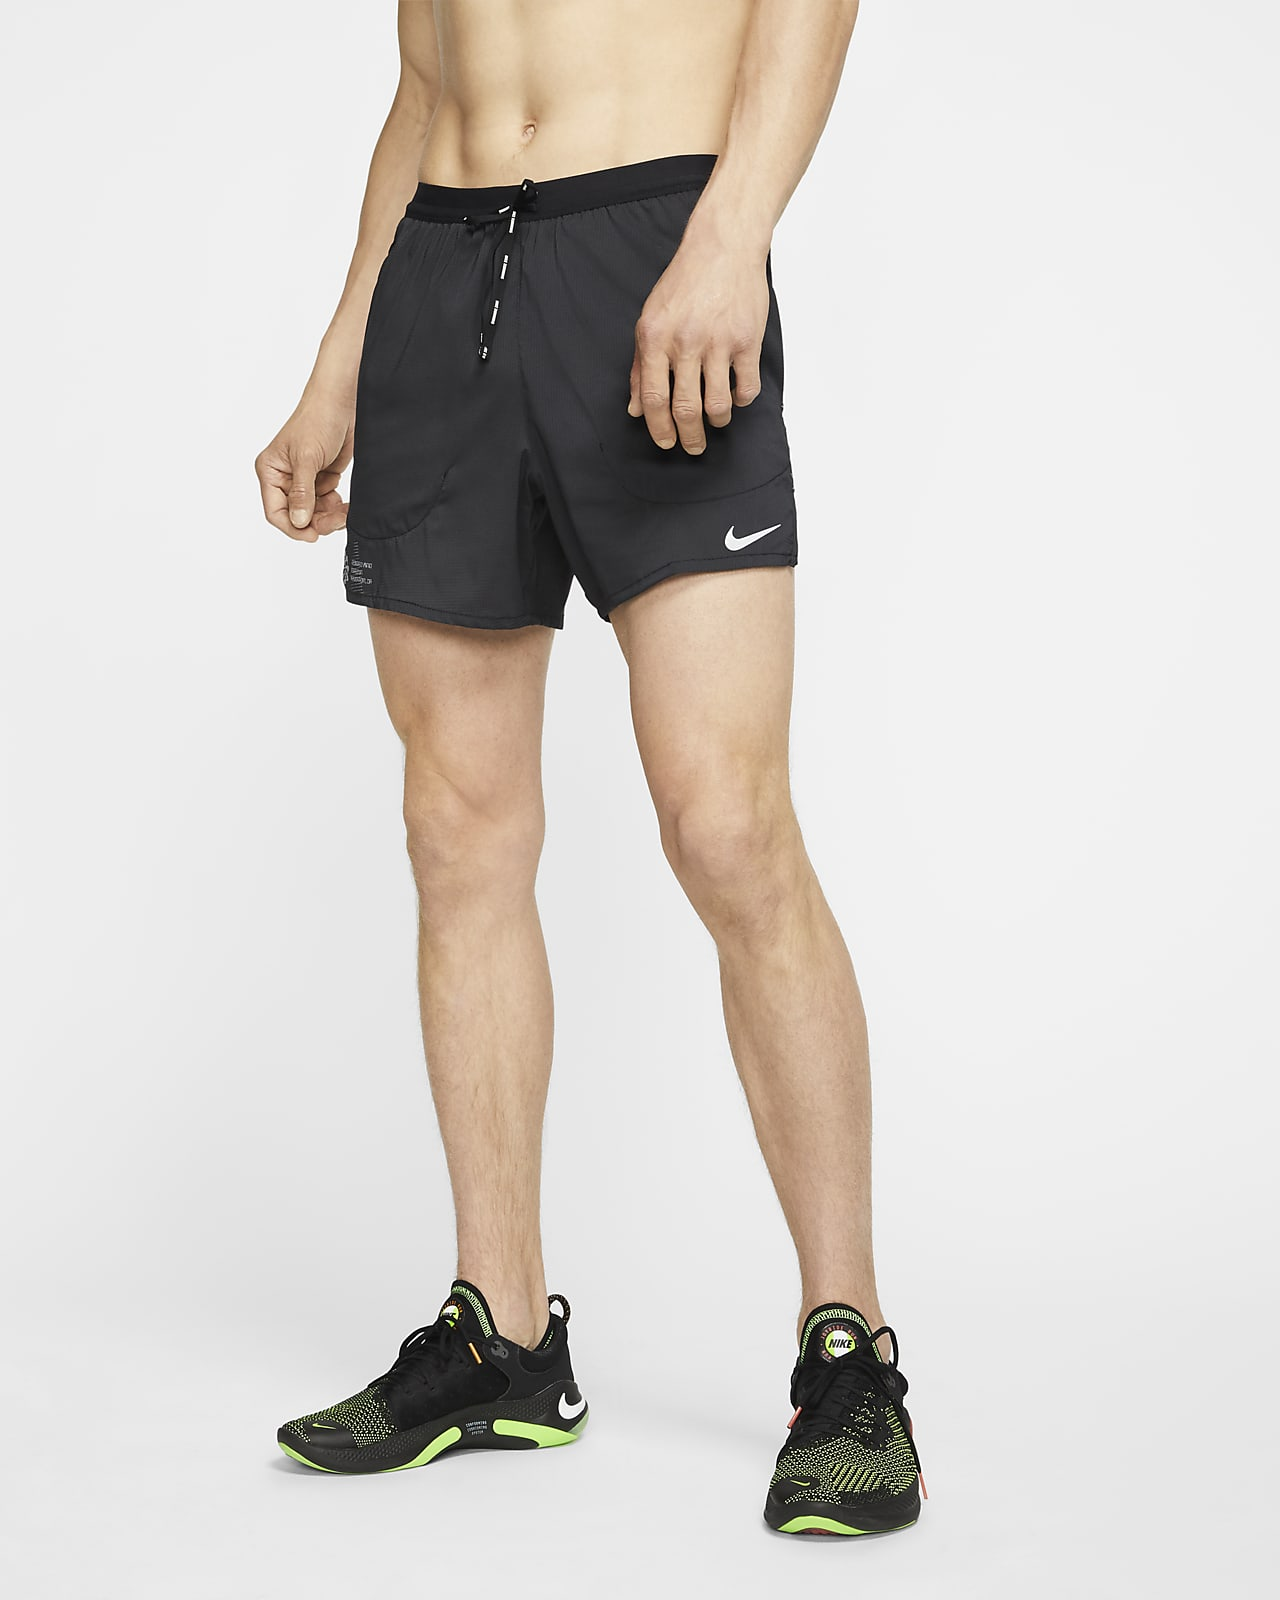 Nike Flex Stride Future Fast Men's 5